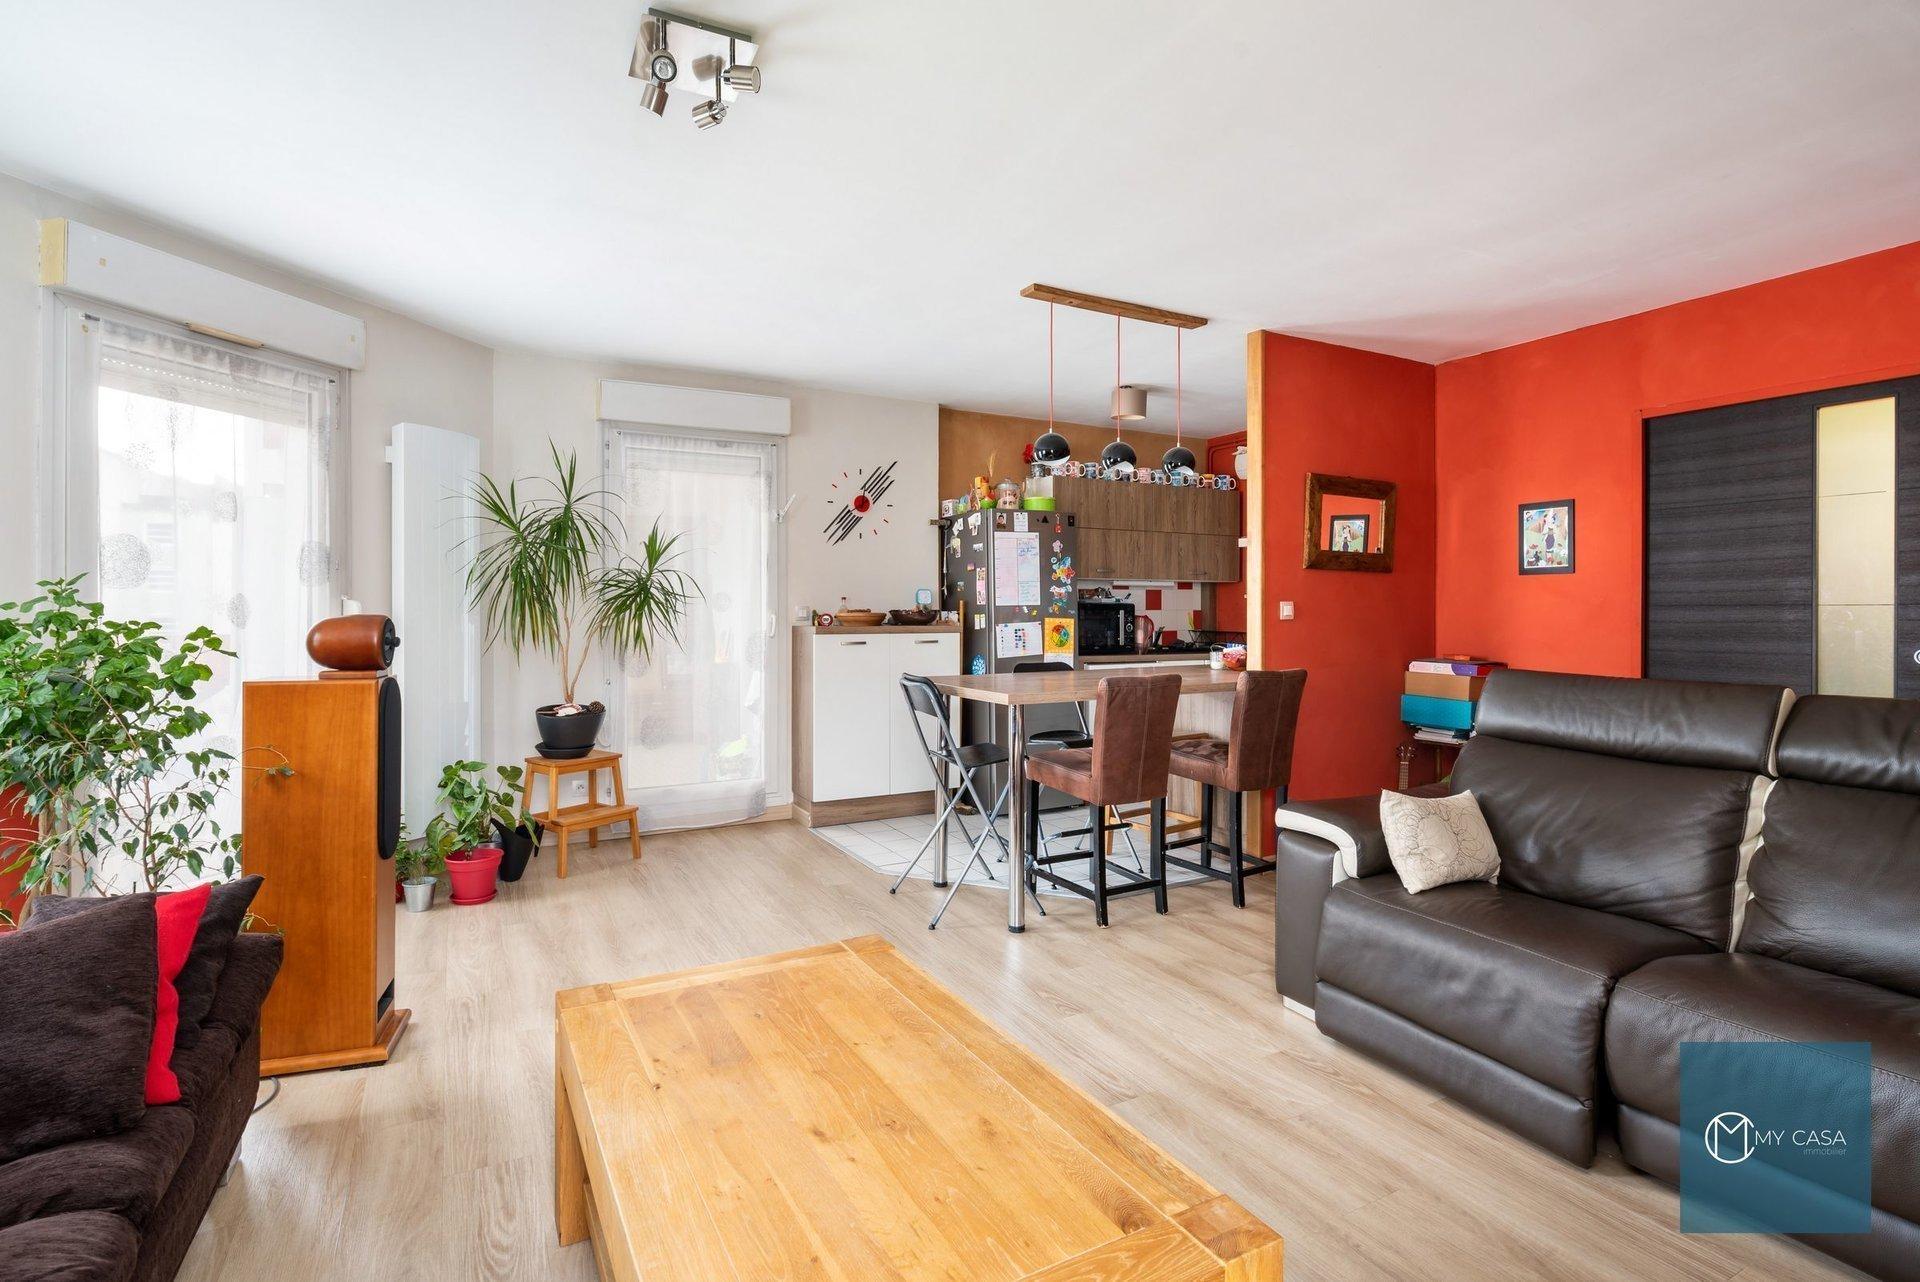 GERLAND - Joli T4 de 89 m2 avec Balcon